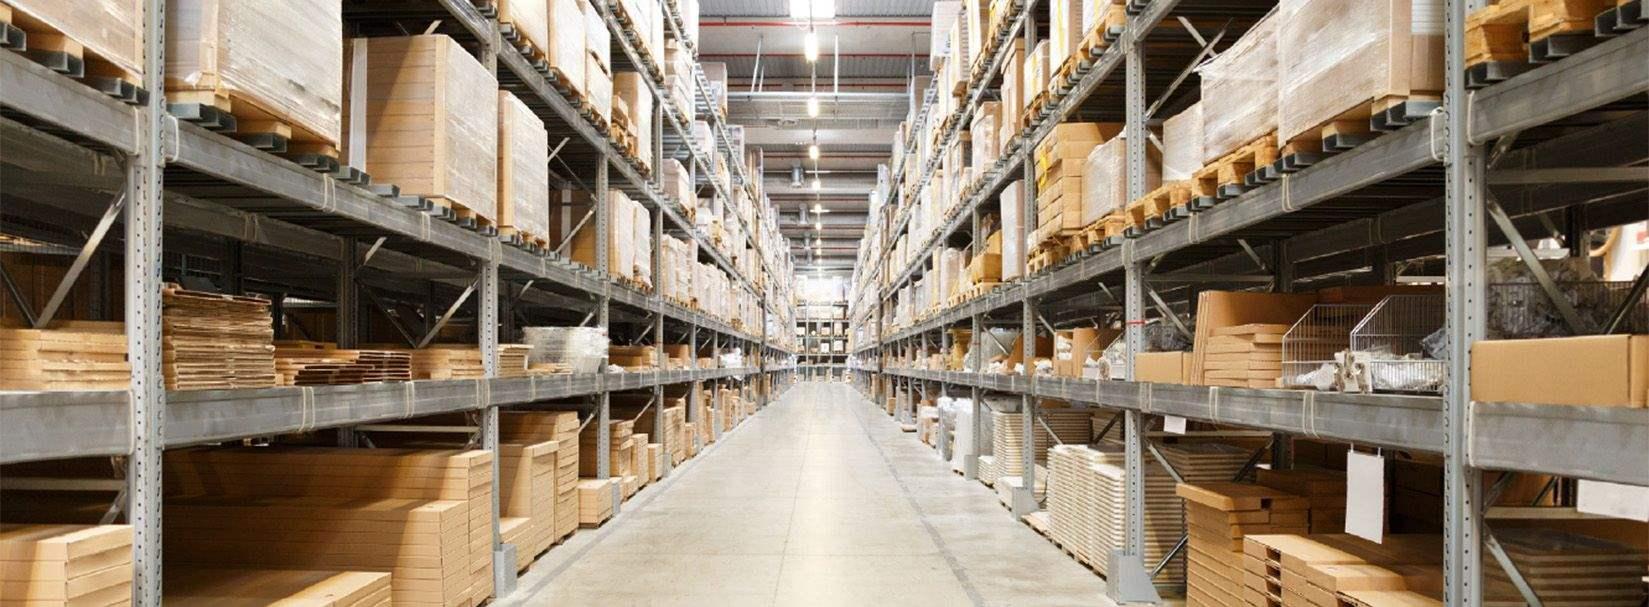 savills-market-in-minutes-logistic-industrial-q2-2018